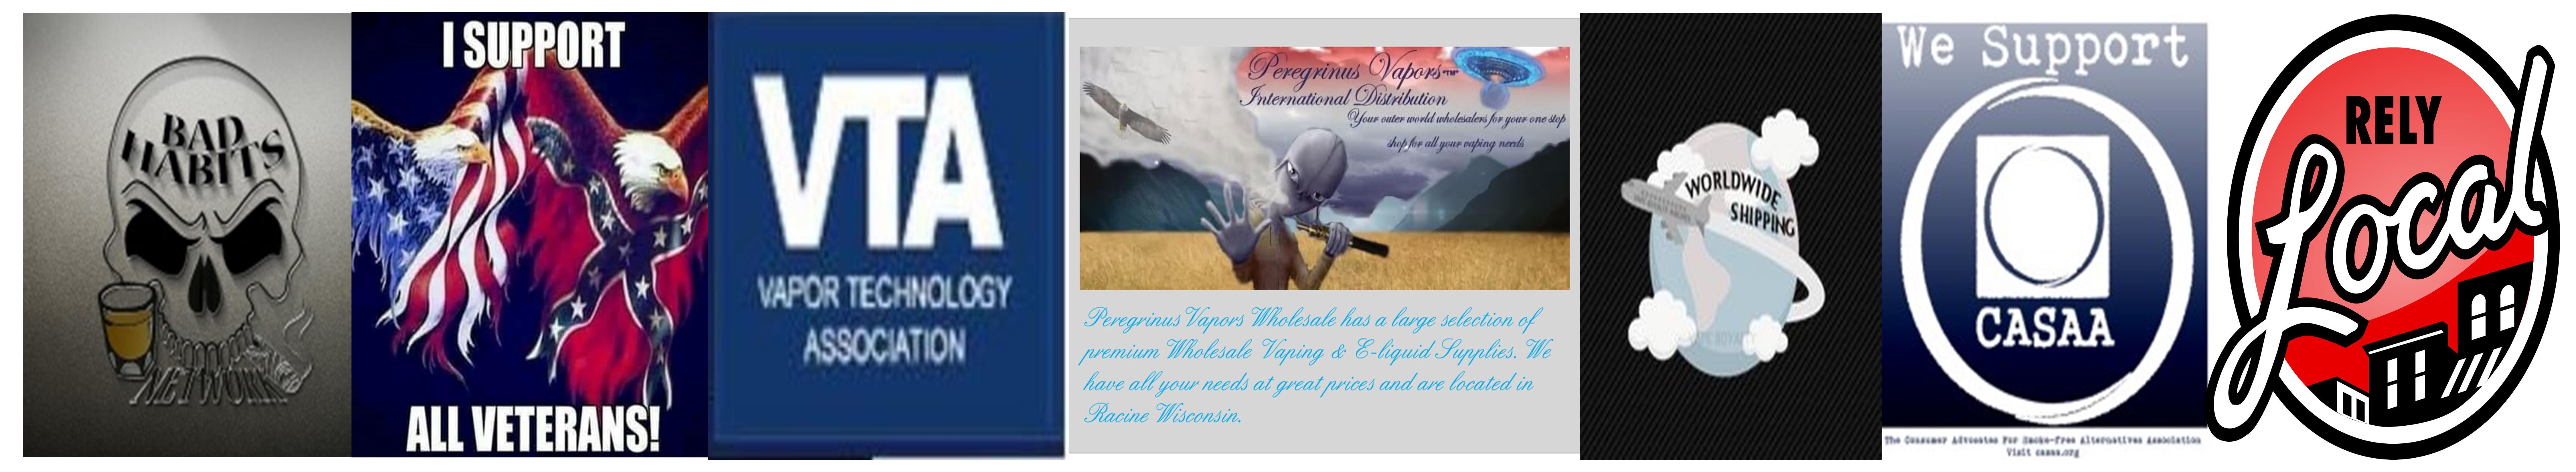 new-peregrinus-banner.jpg